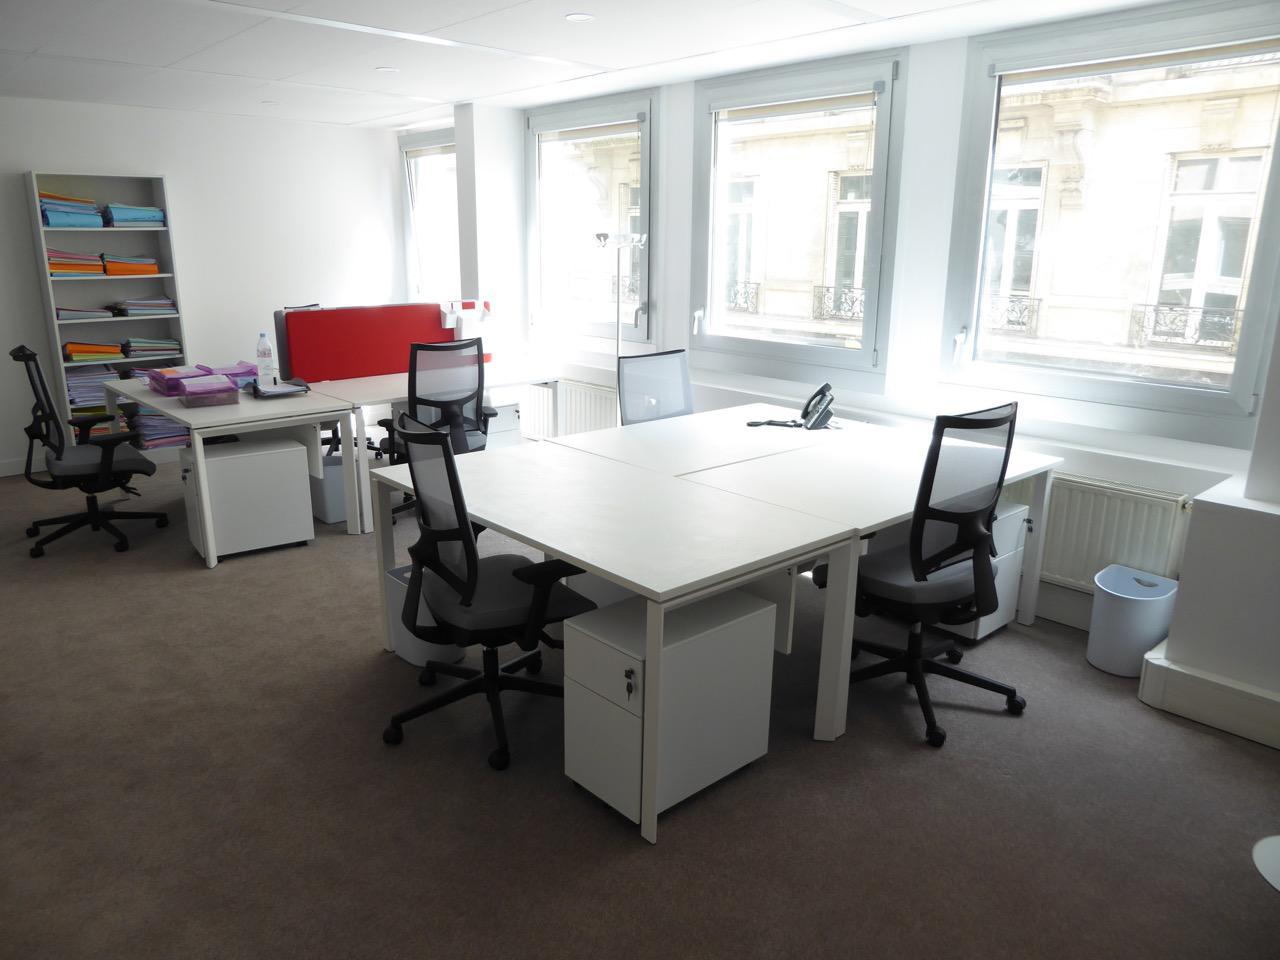 Location Bureau Paris 8 75008 18m Bureauxlocaux Com